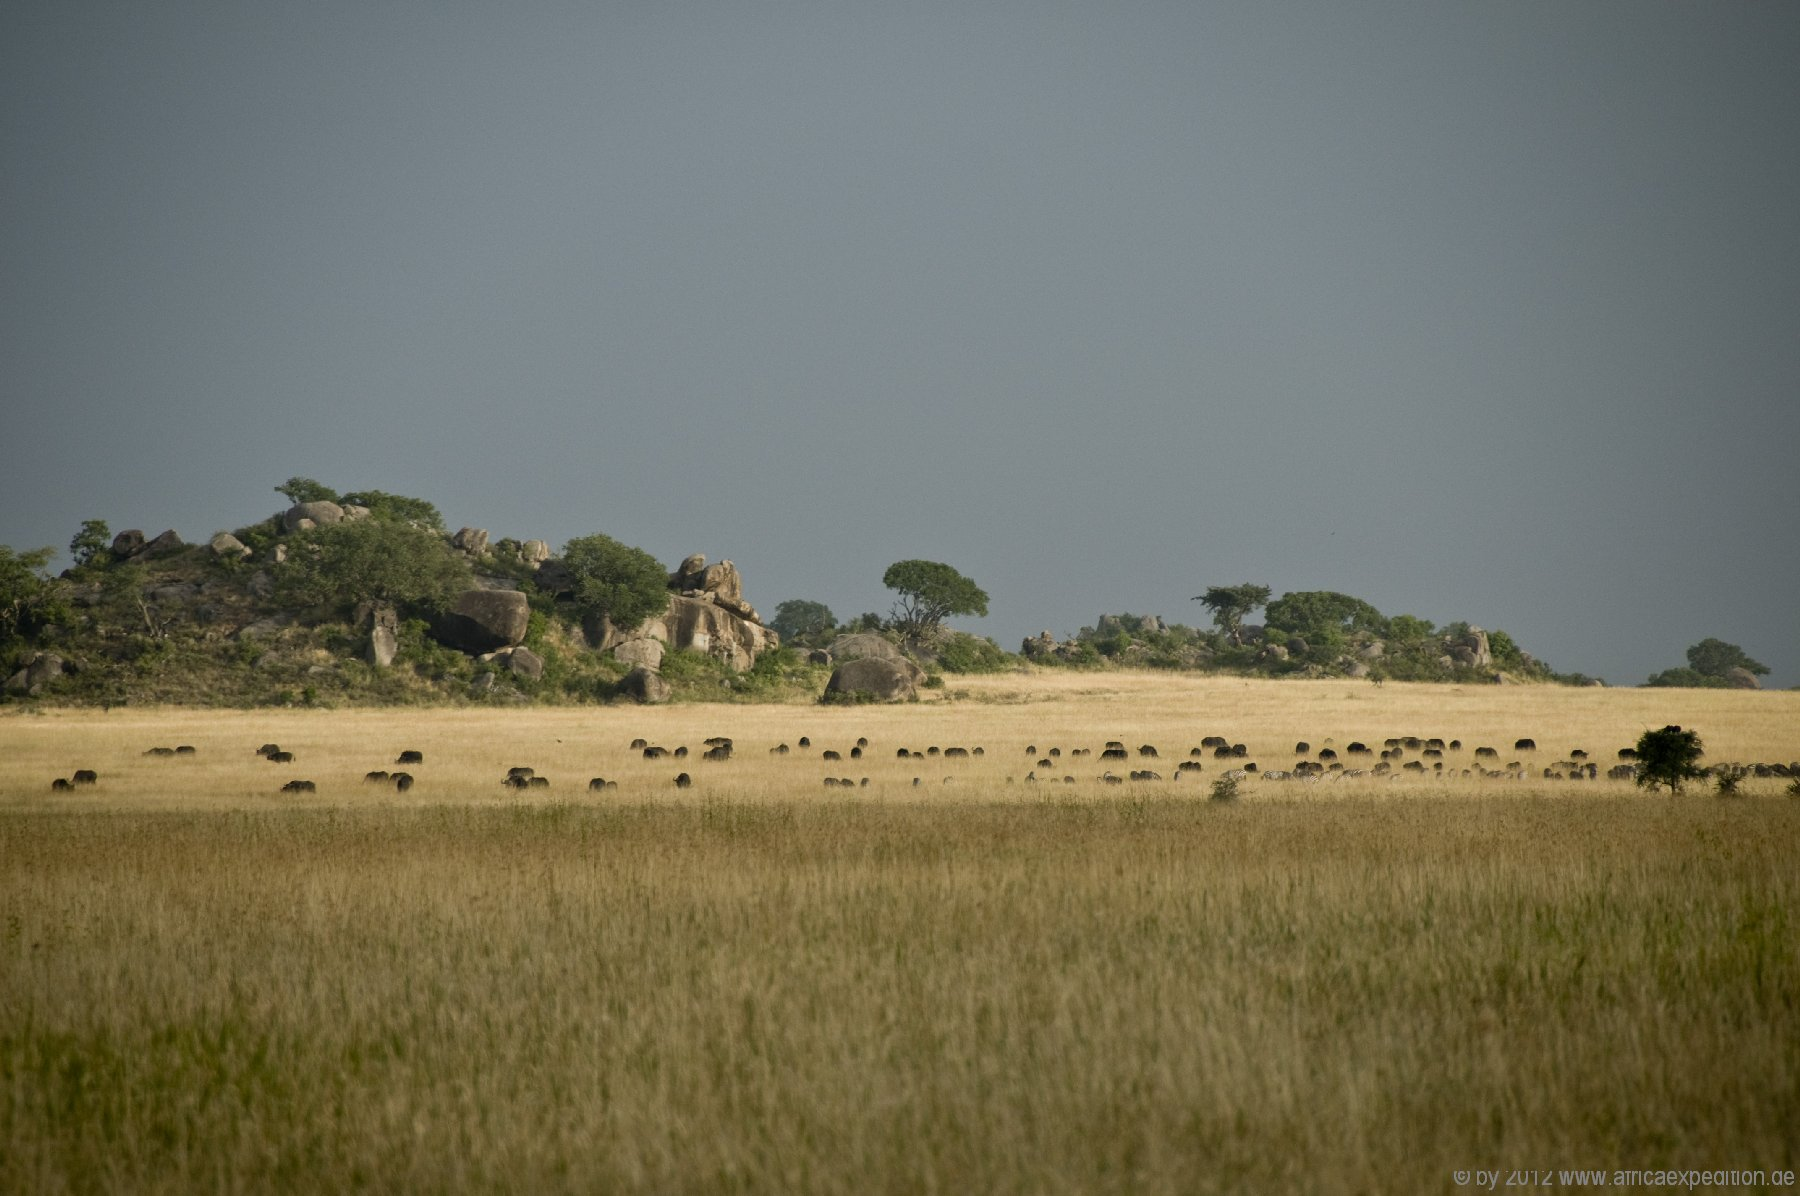 tanzania_africaexpedition_de_015